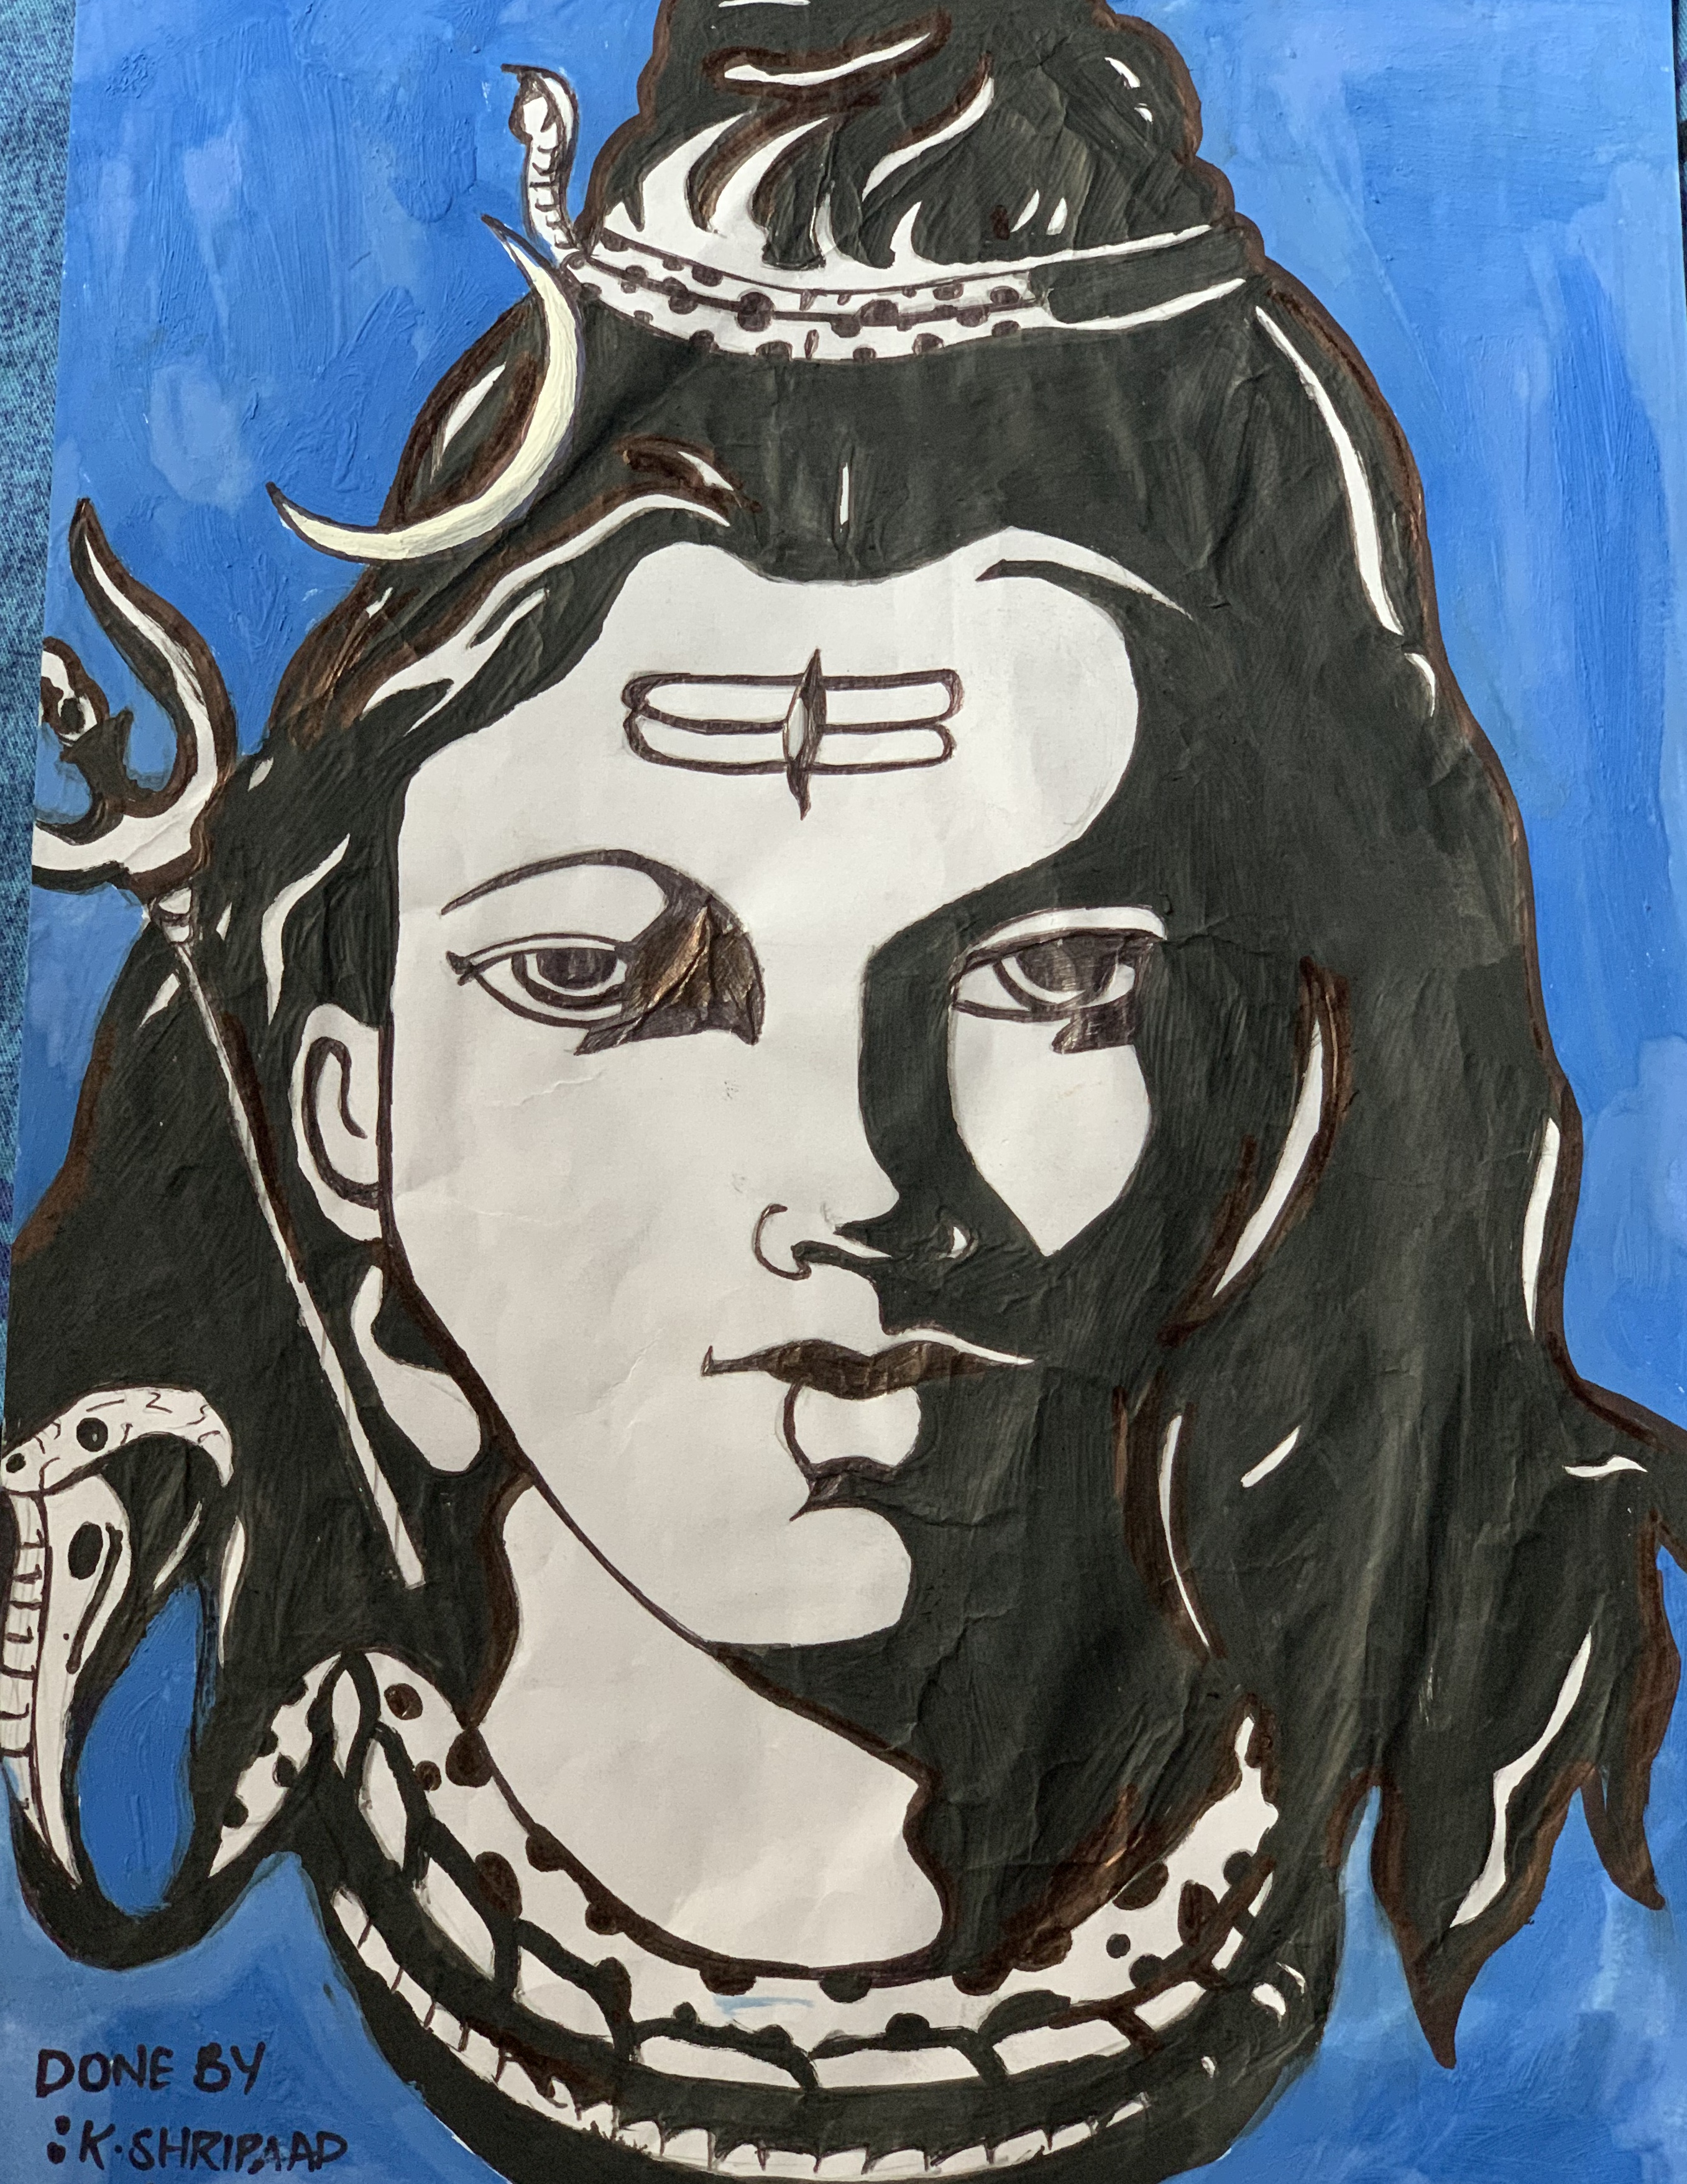 K Shripaad's Painting Of Lord Shiva